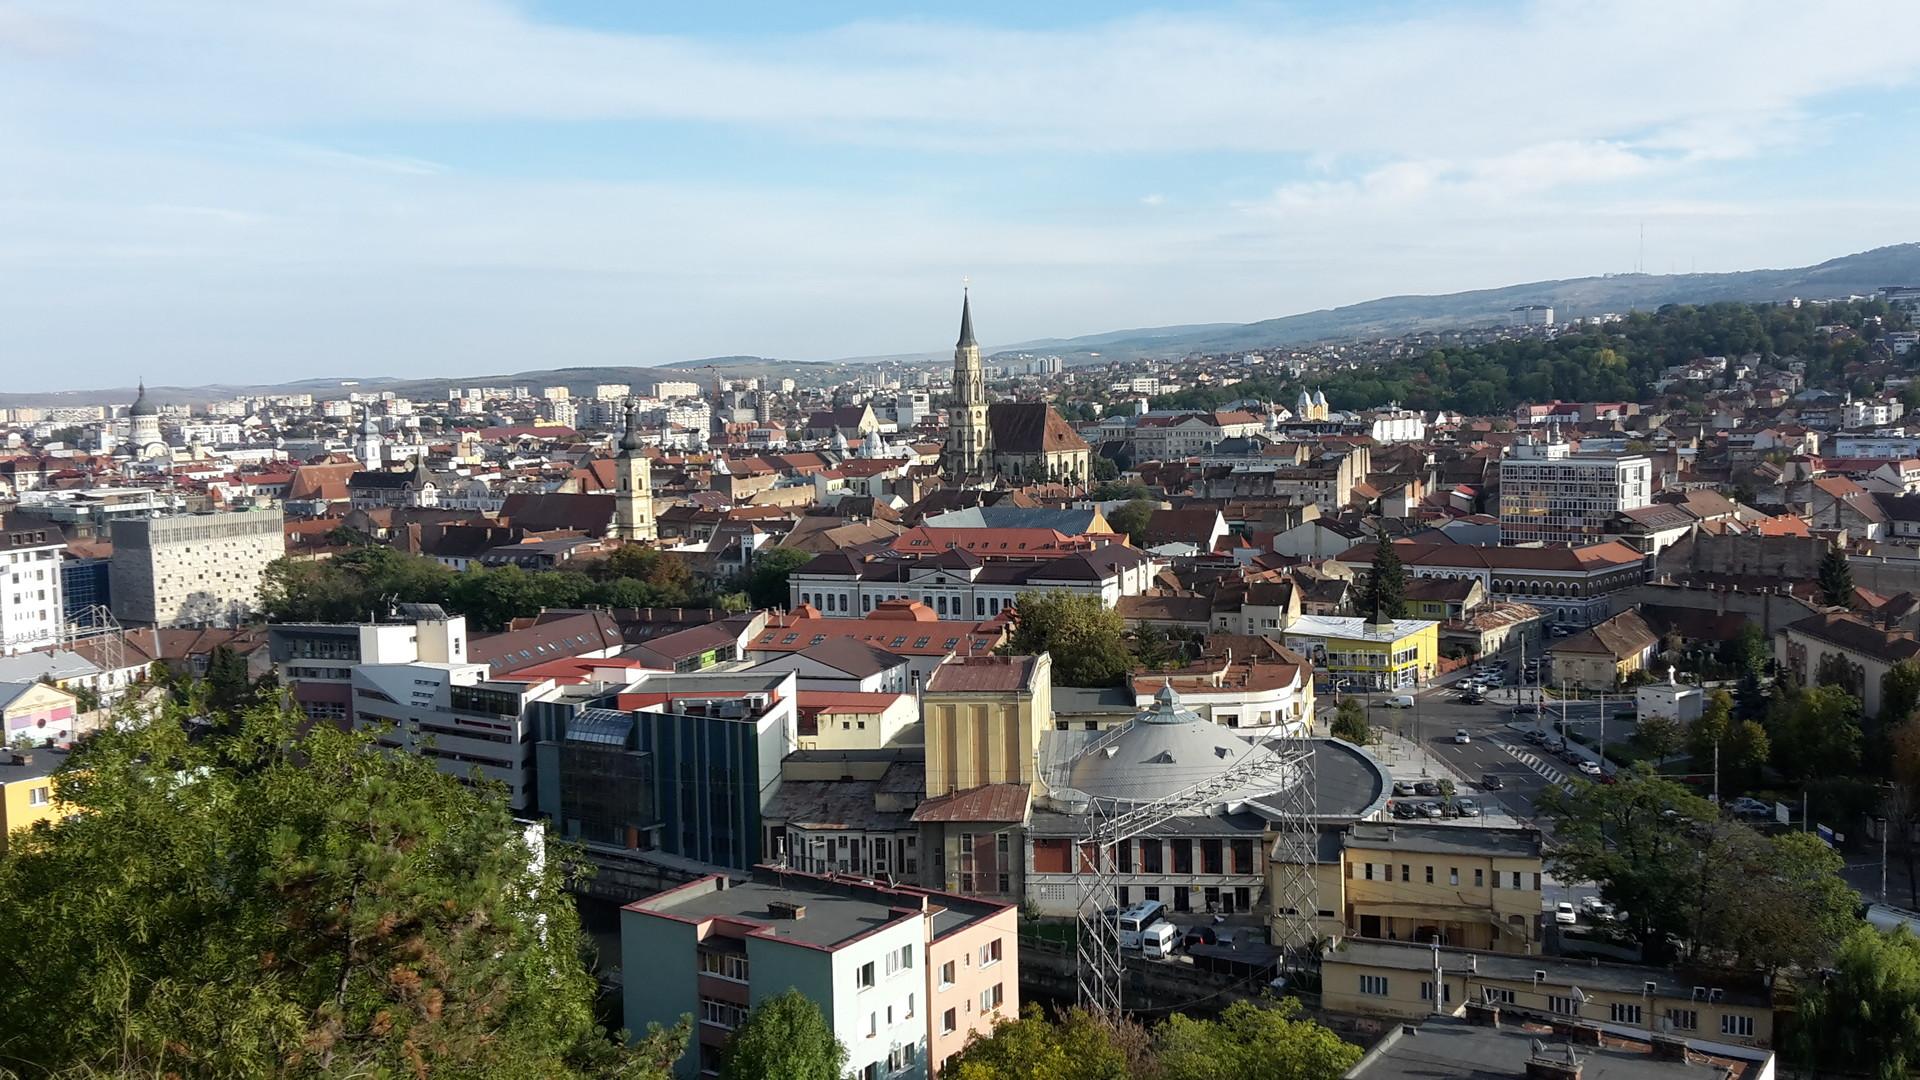 Expérience Erasmus à Cluj-Napoca, Roumanie, par Amaia